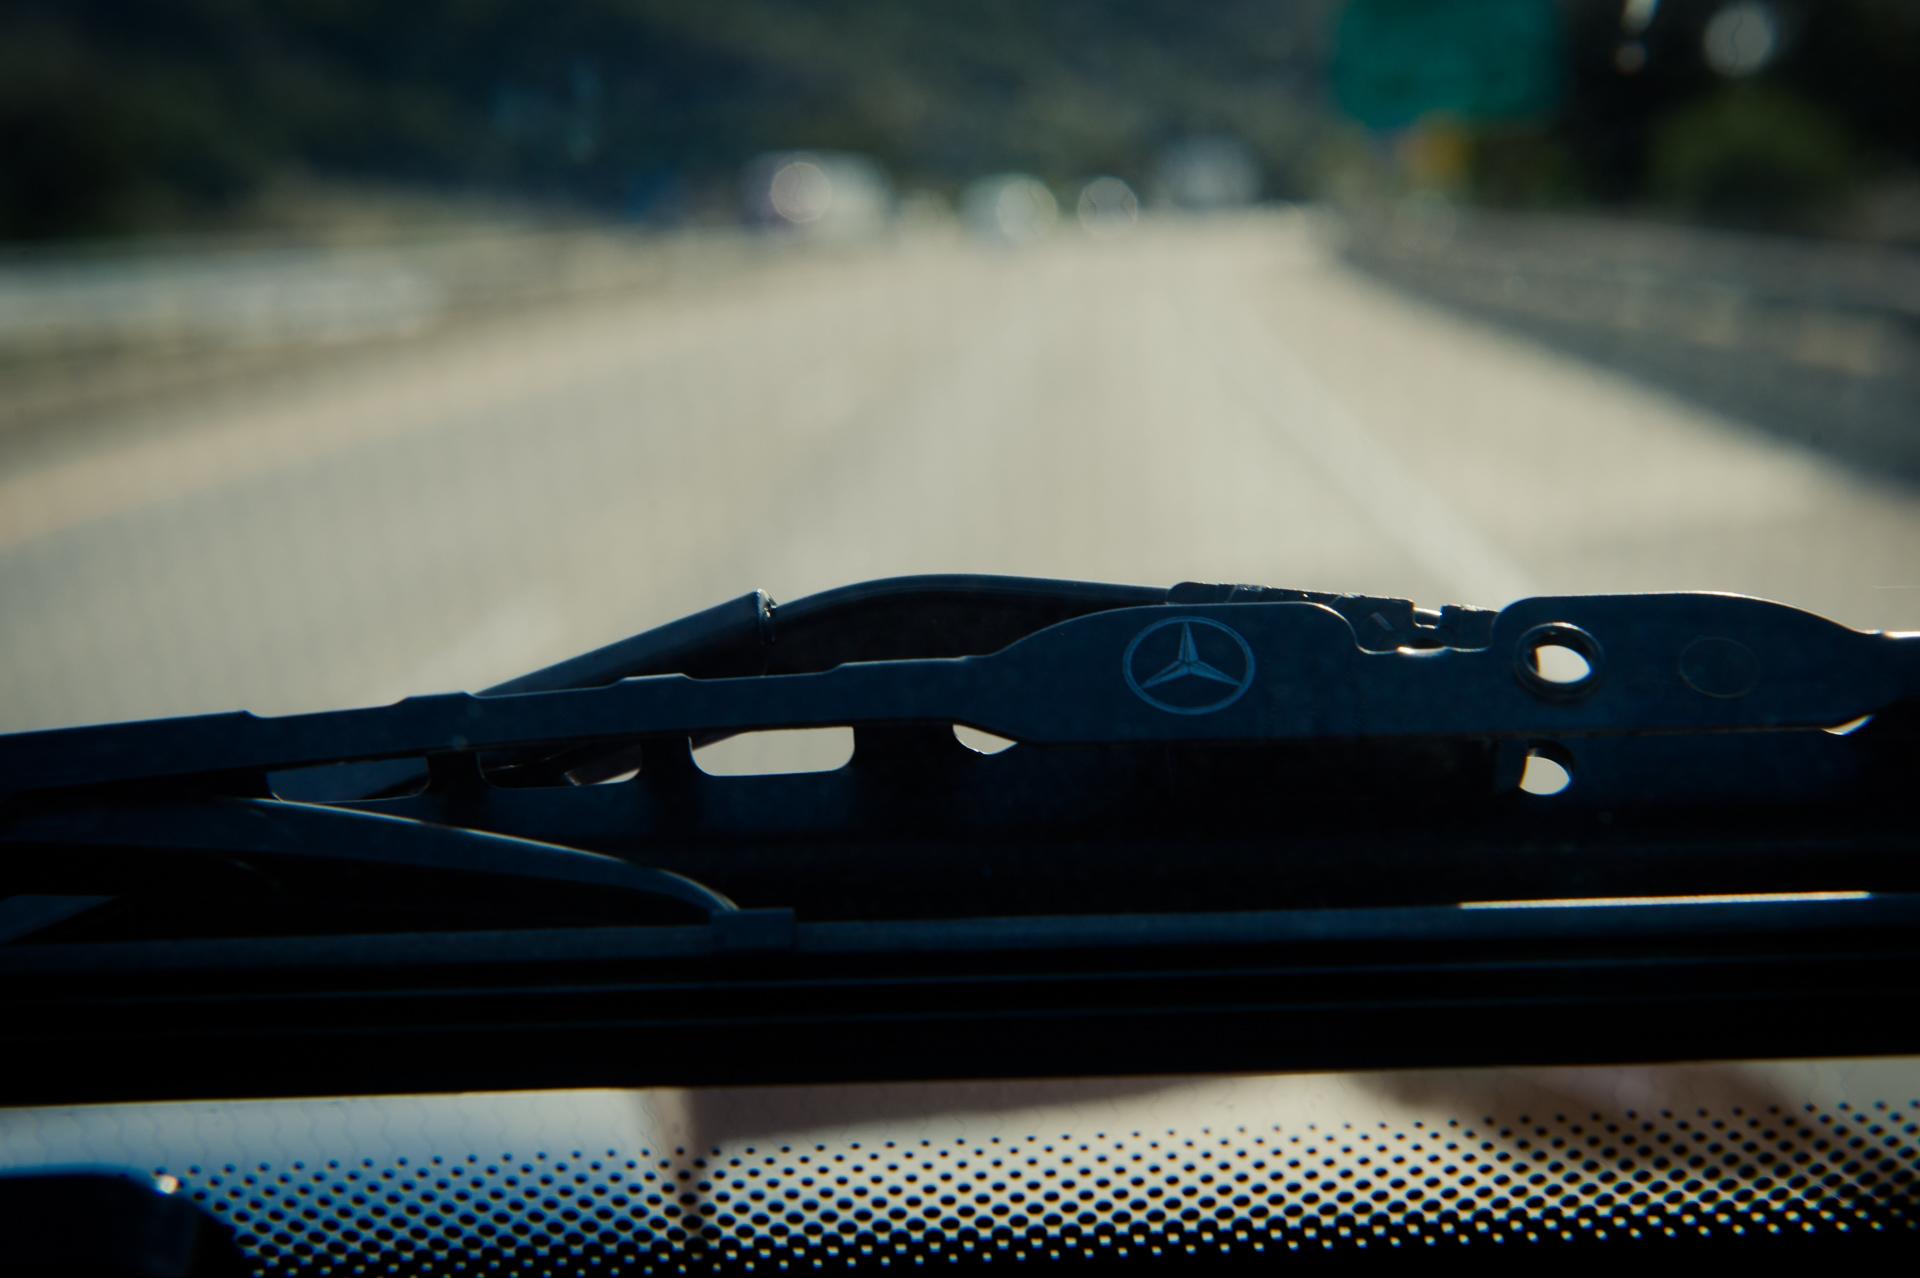 2014-Mercedes-Benz-G500-G550-braun-Kalifornien-mbrt14-14